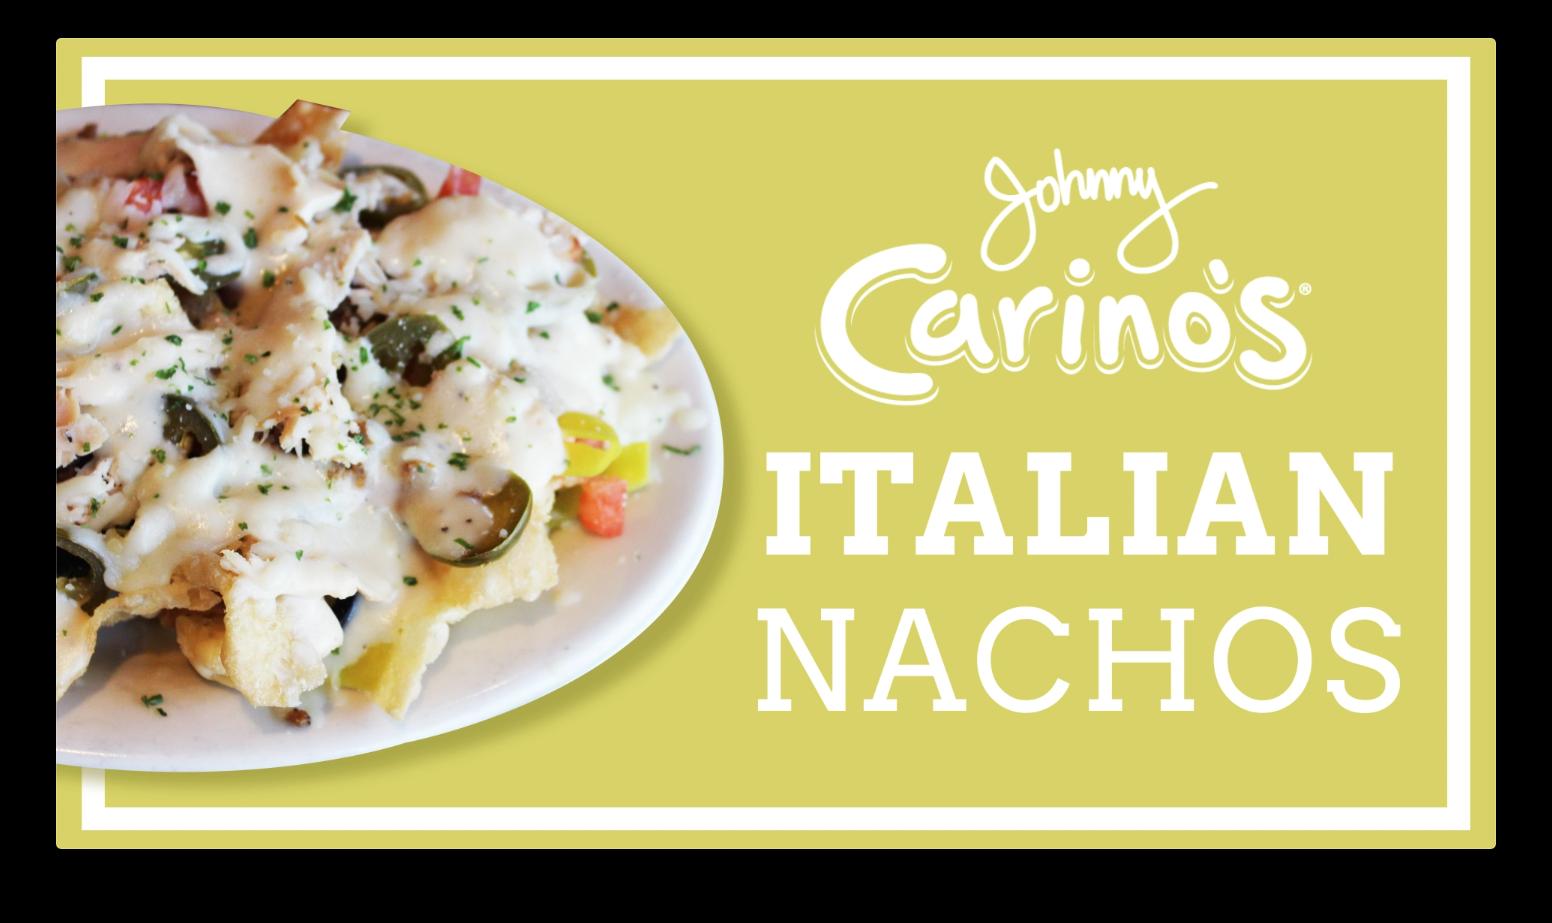 johnny carino's italian nachos motion graphic screenshot